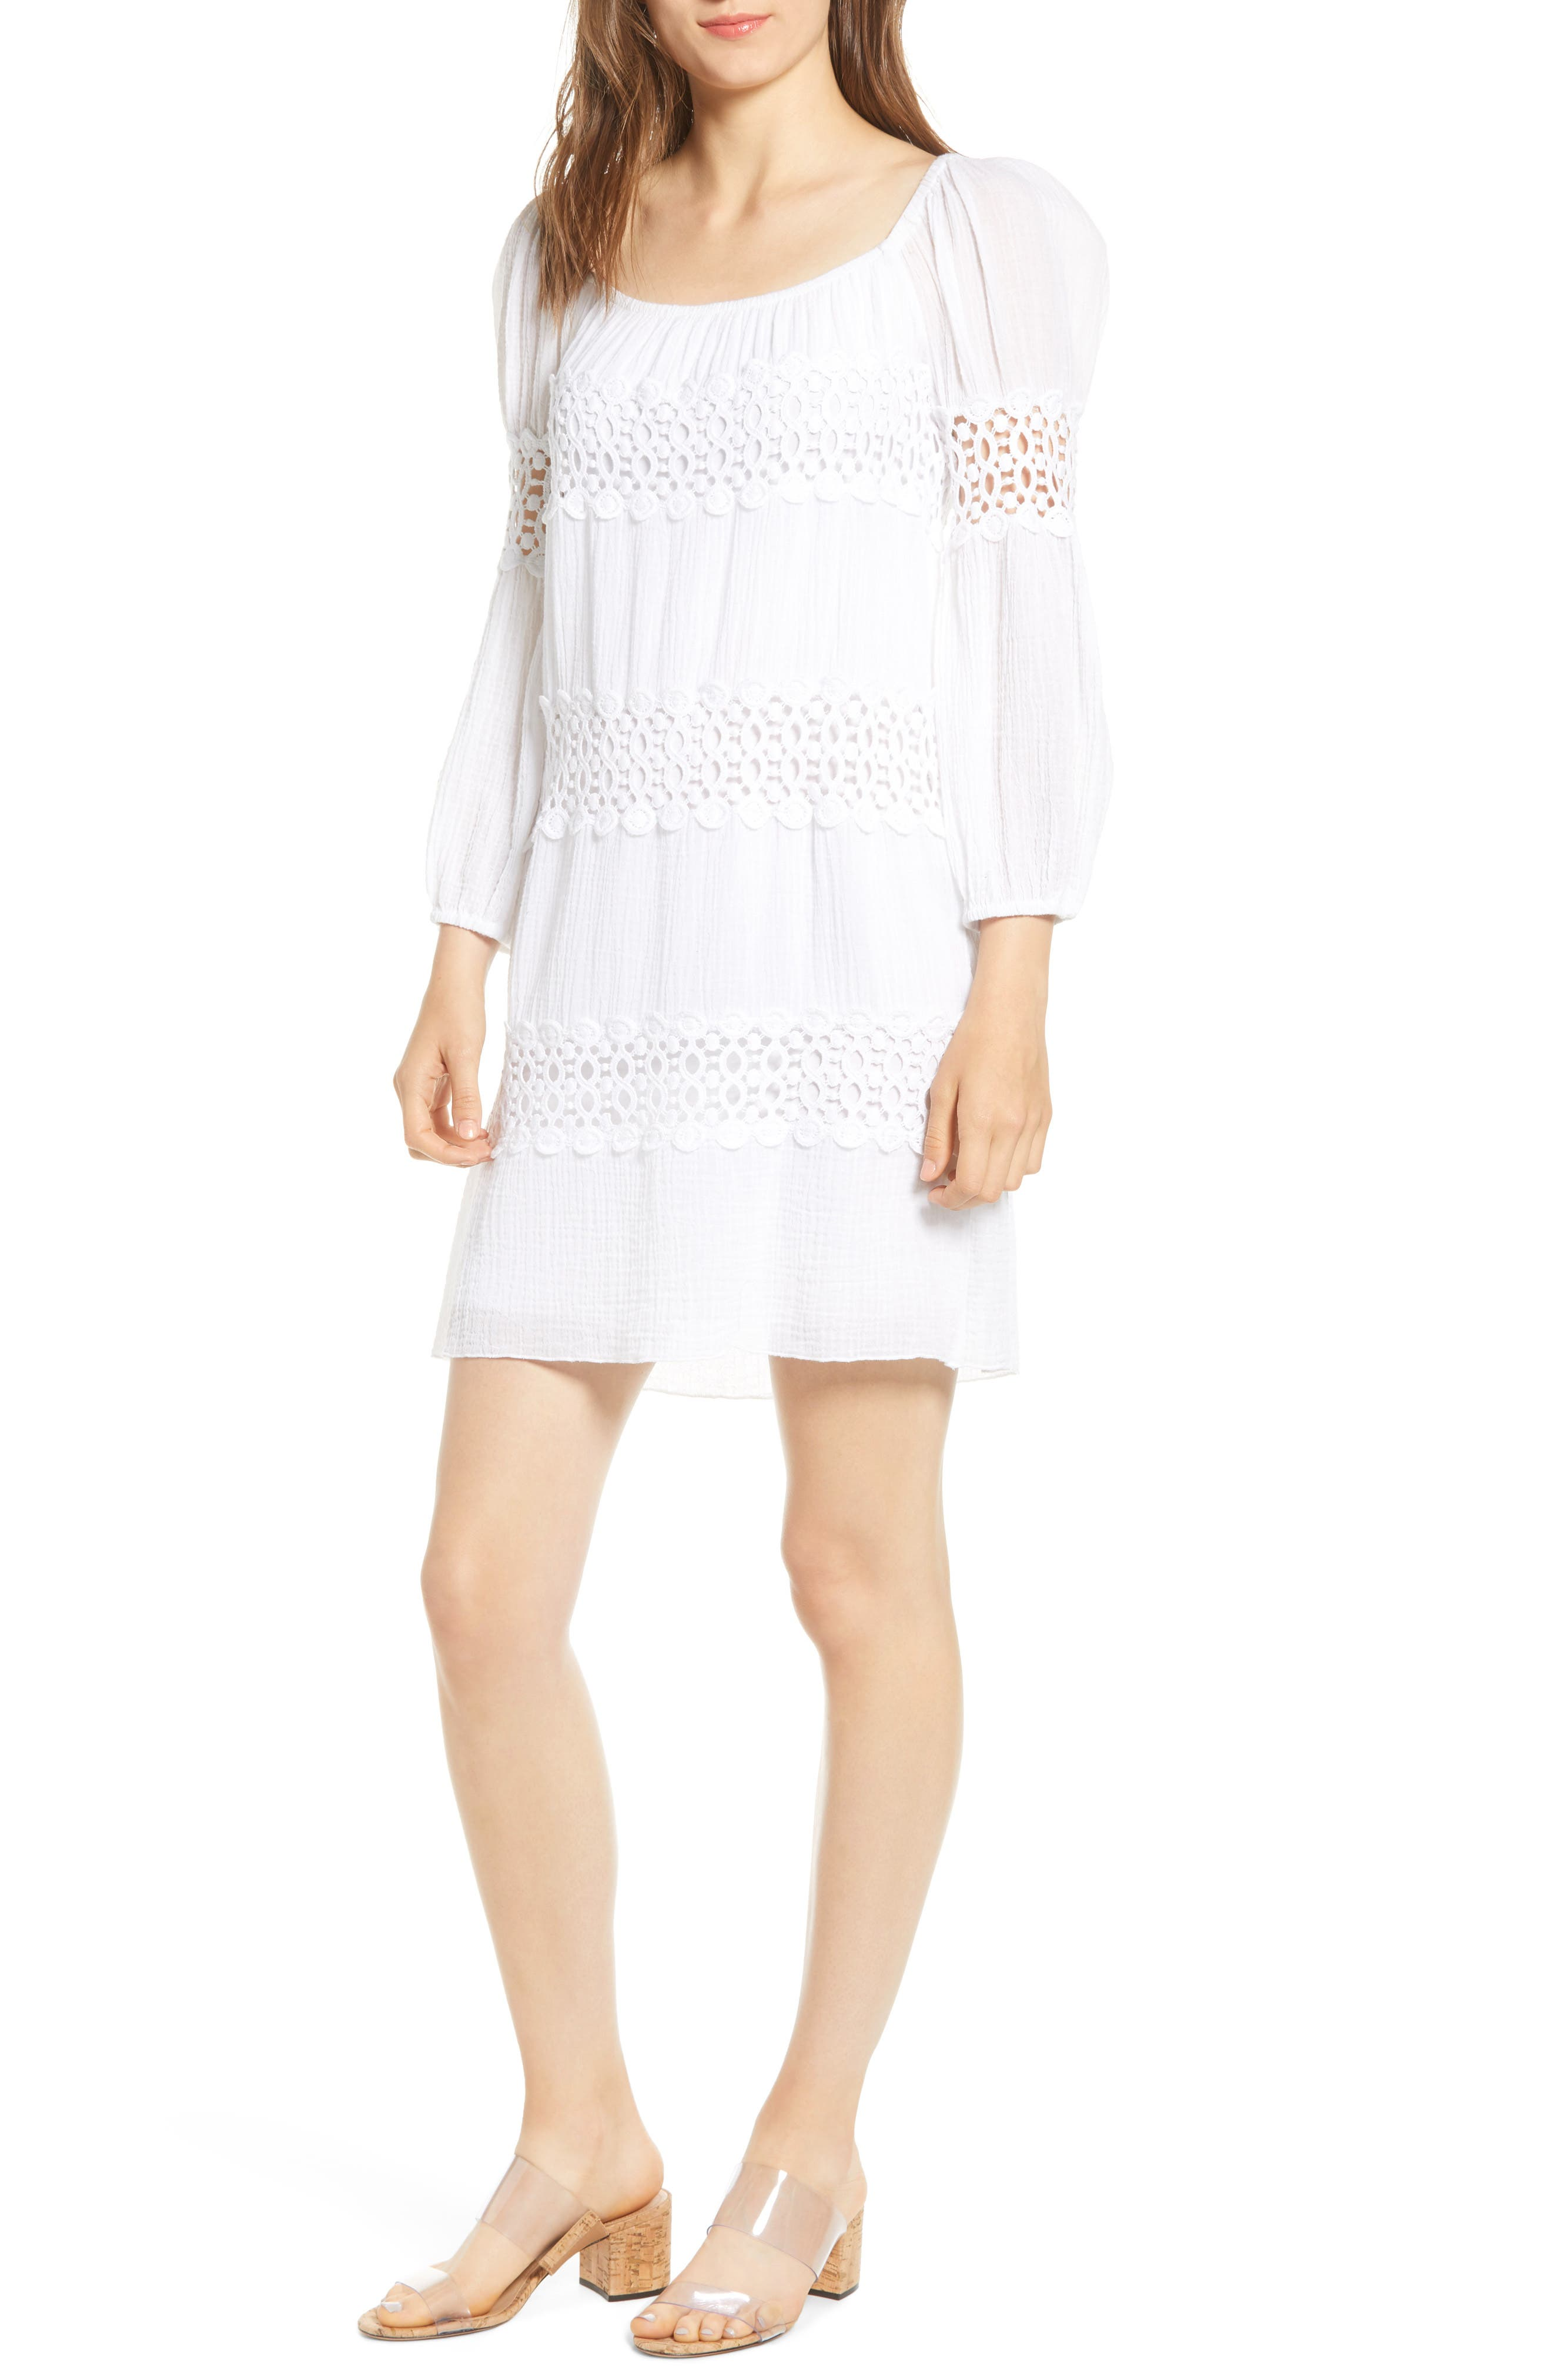 Bailey 44 Mykonos Lace Detail Long Sleeve Cotton Shift Dress, White